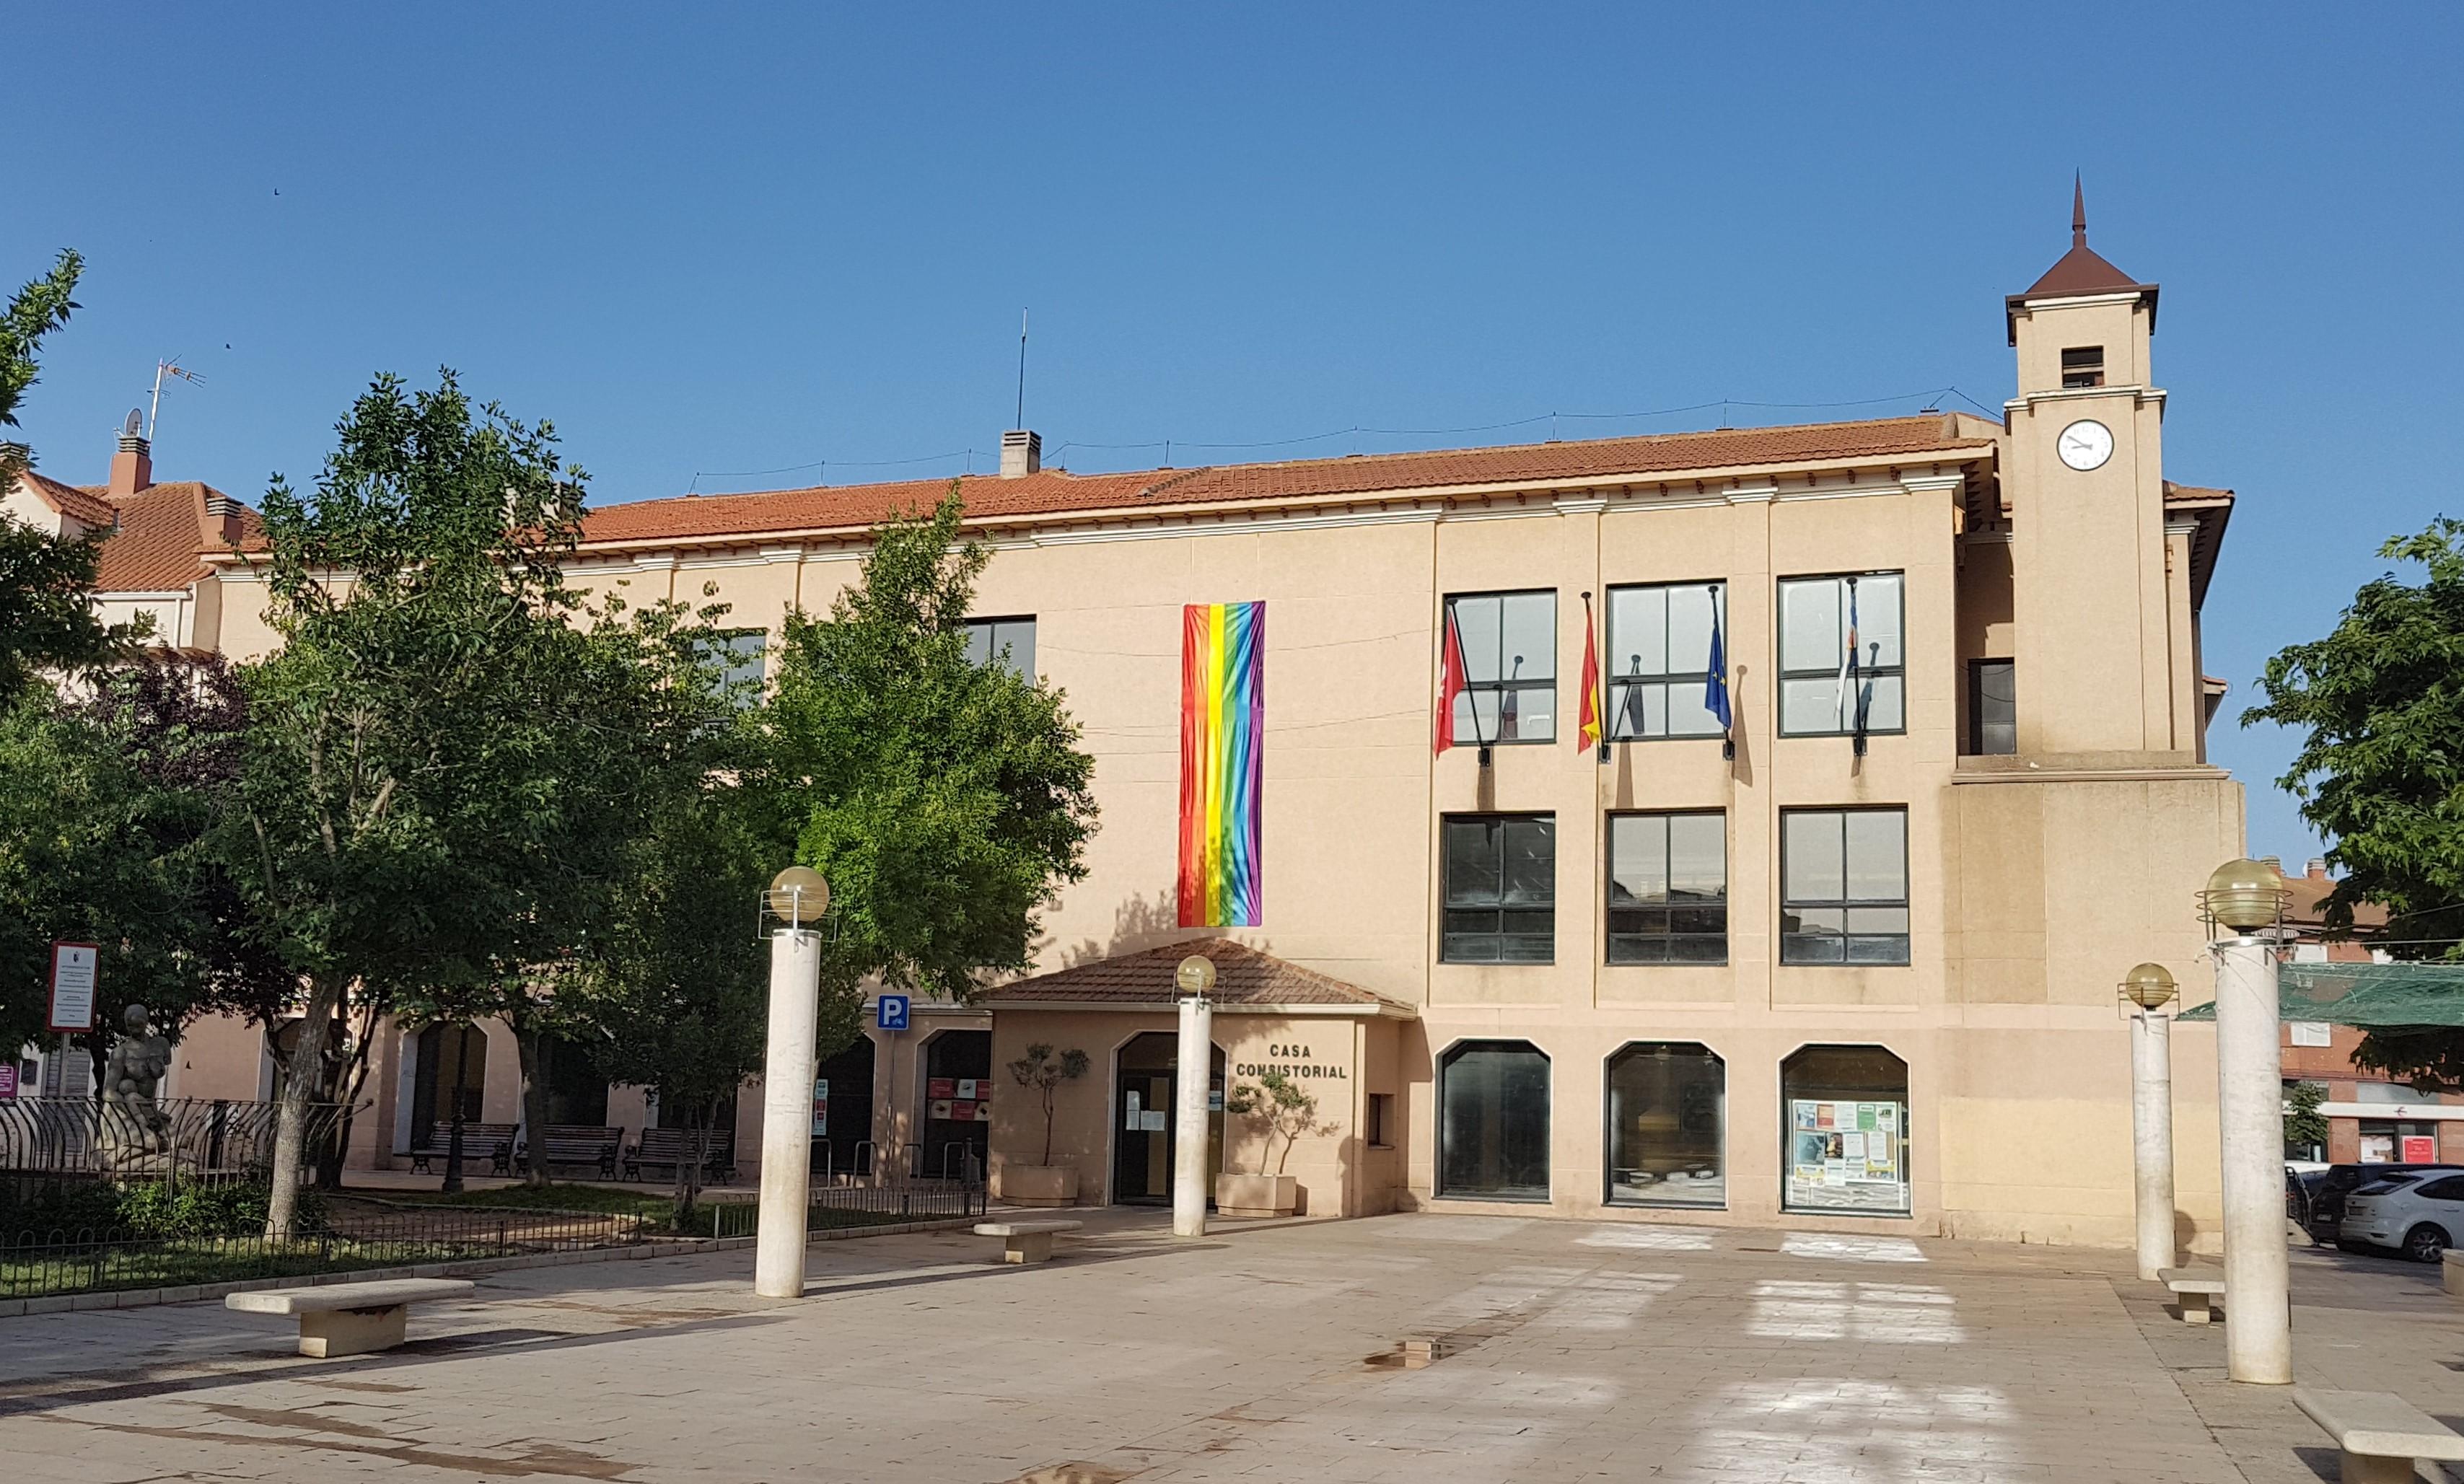 28 de junio, Día internacional del orgullo LGTBIQ